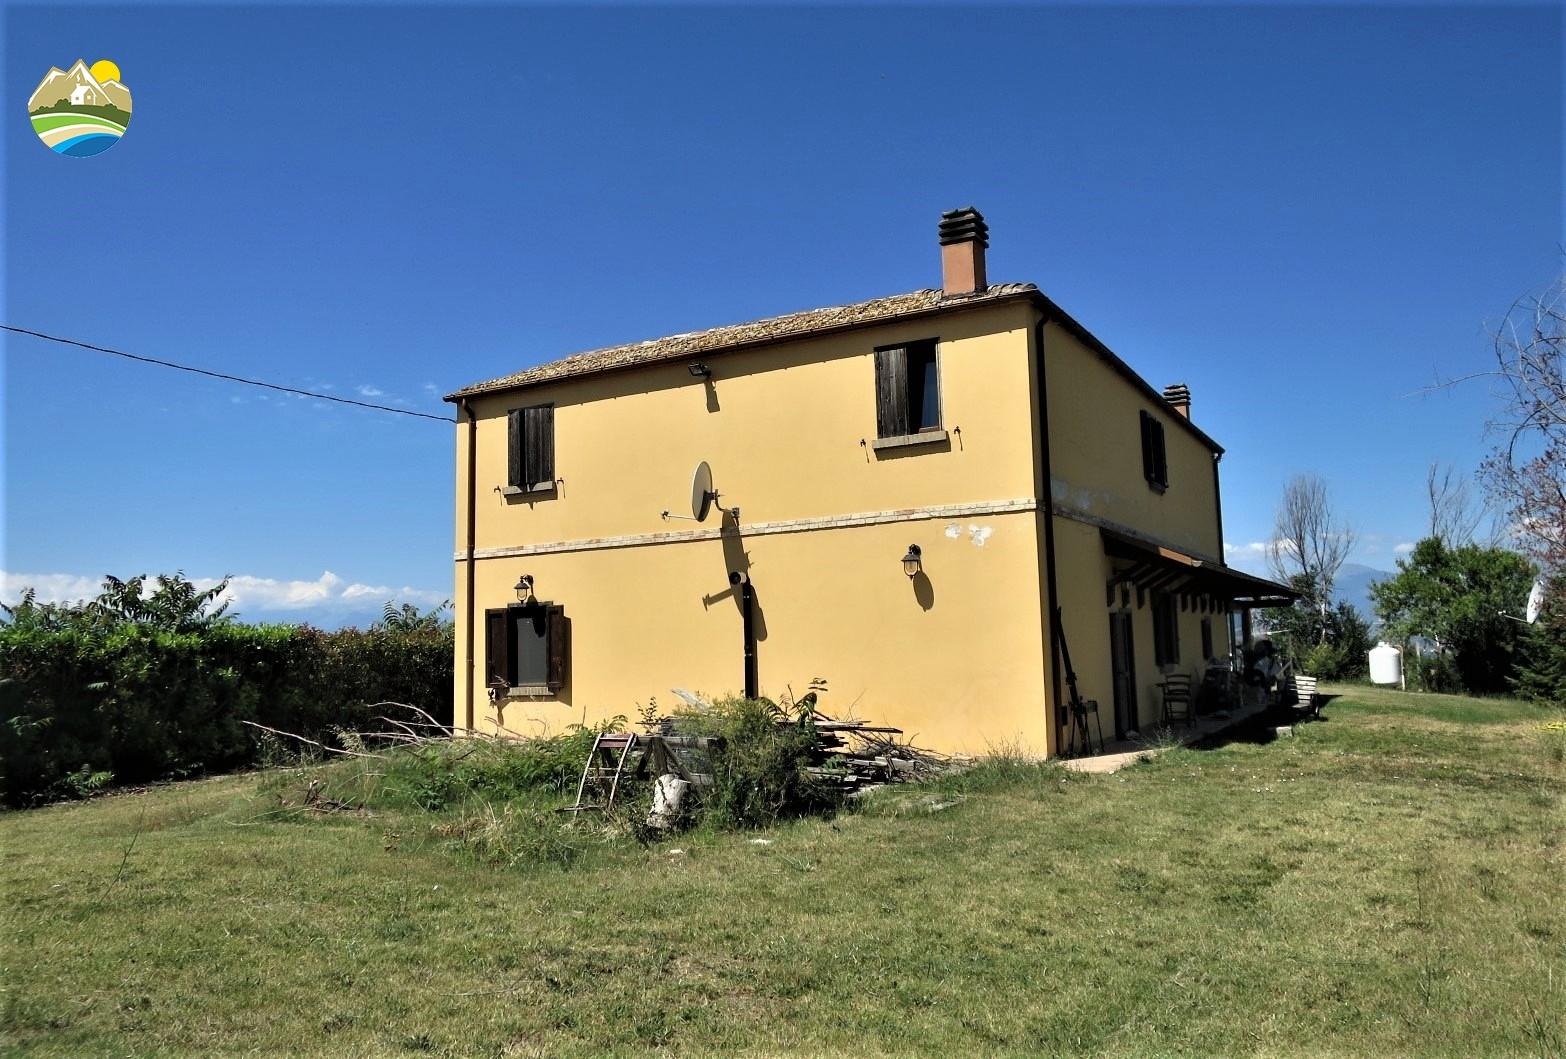 Country Houses Country Houses for sale Morro D'Oro (TE), Casa del Moro - Morro D'Oro - EUR 327.141 470